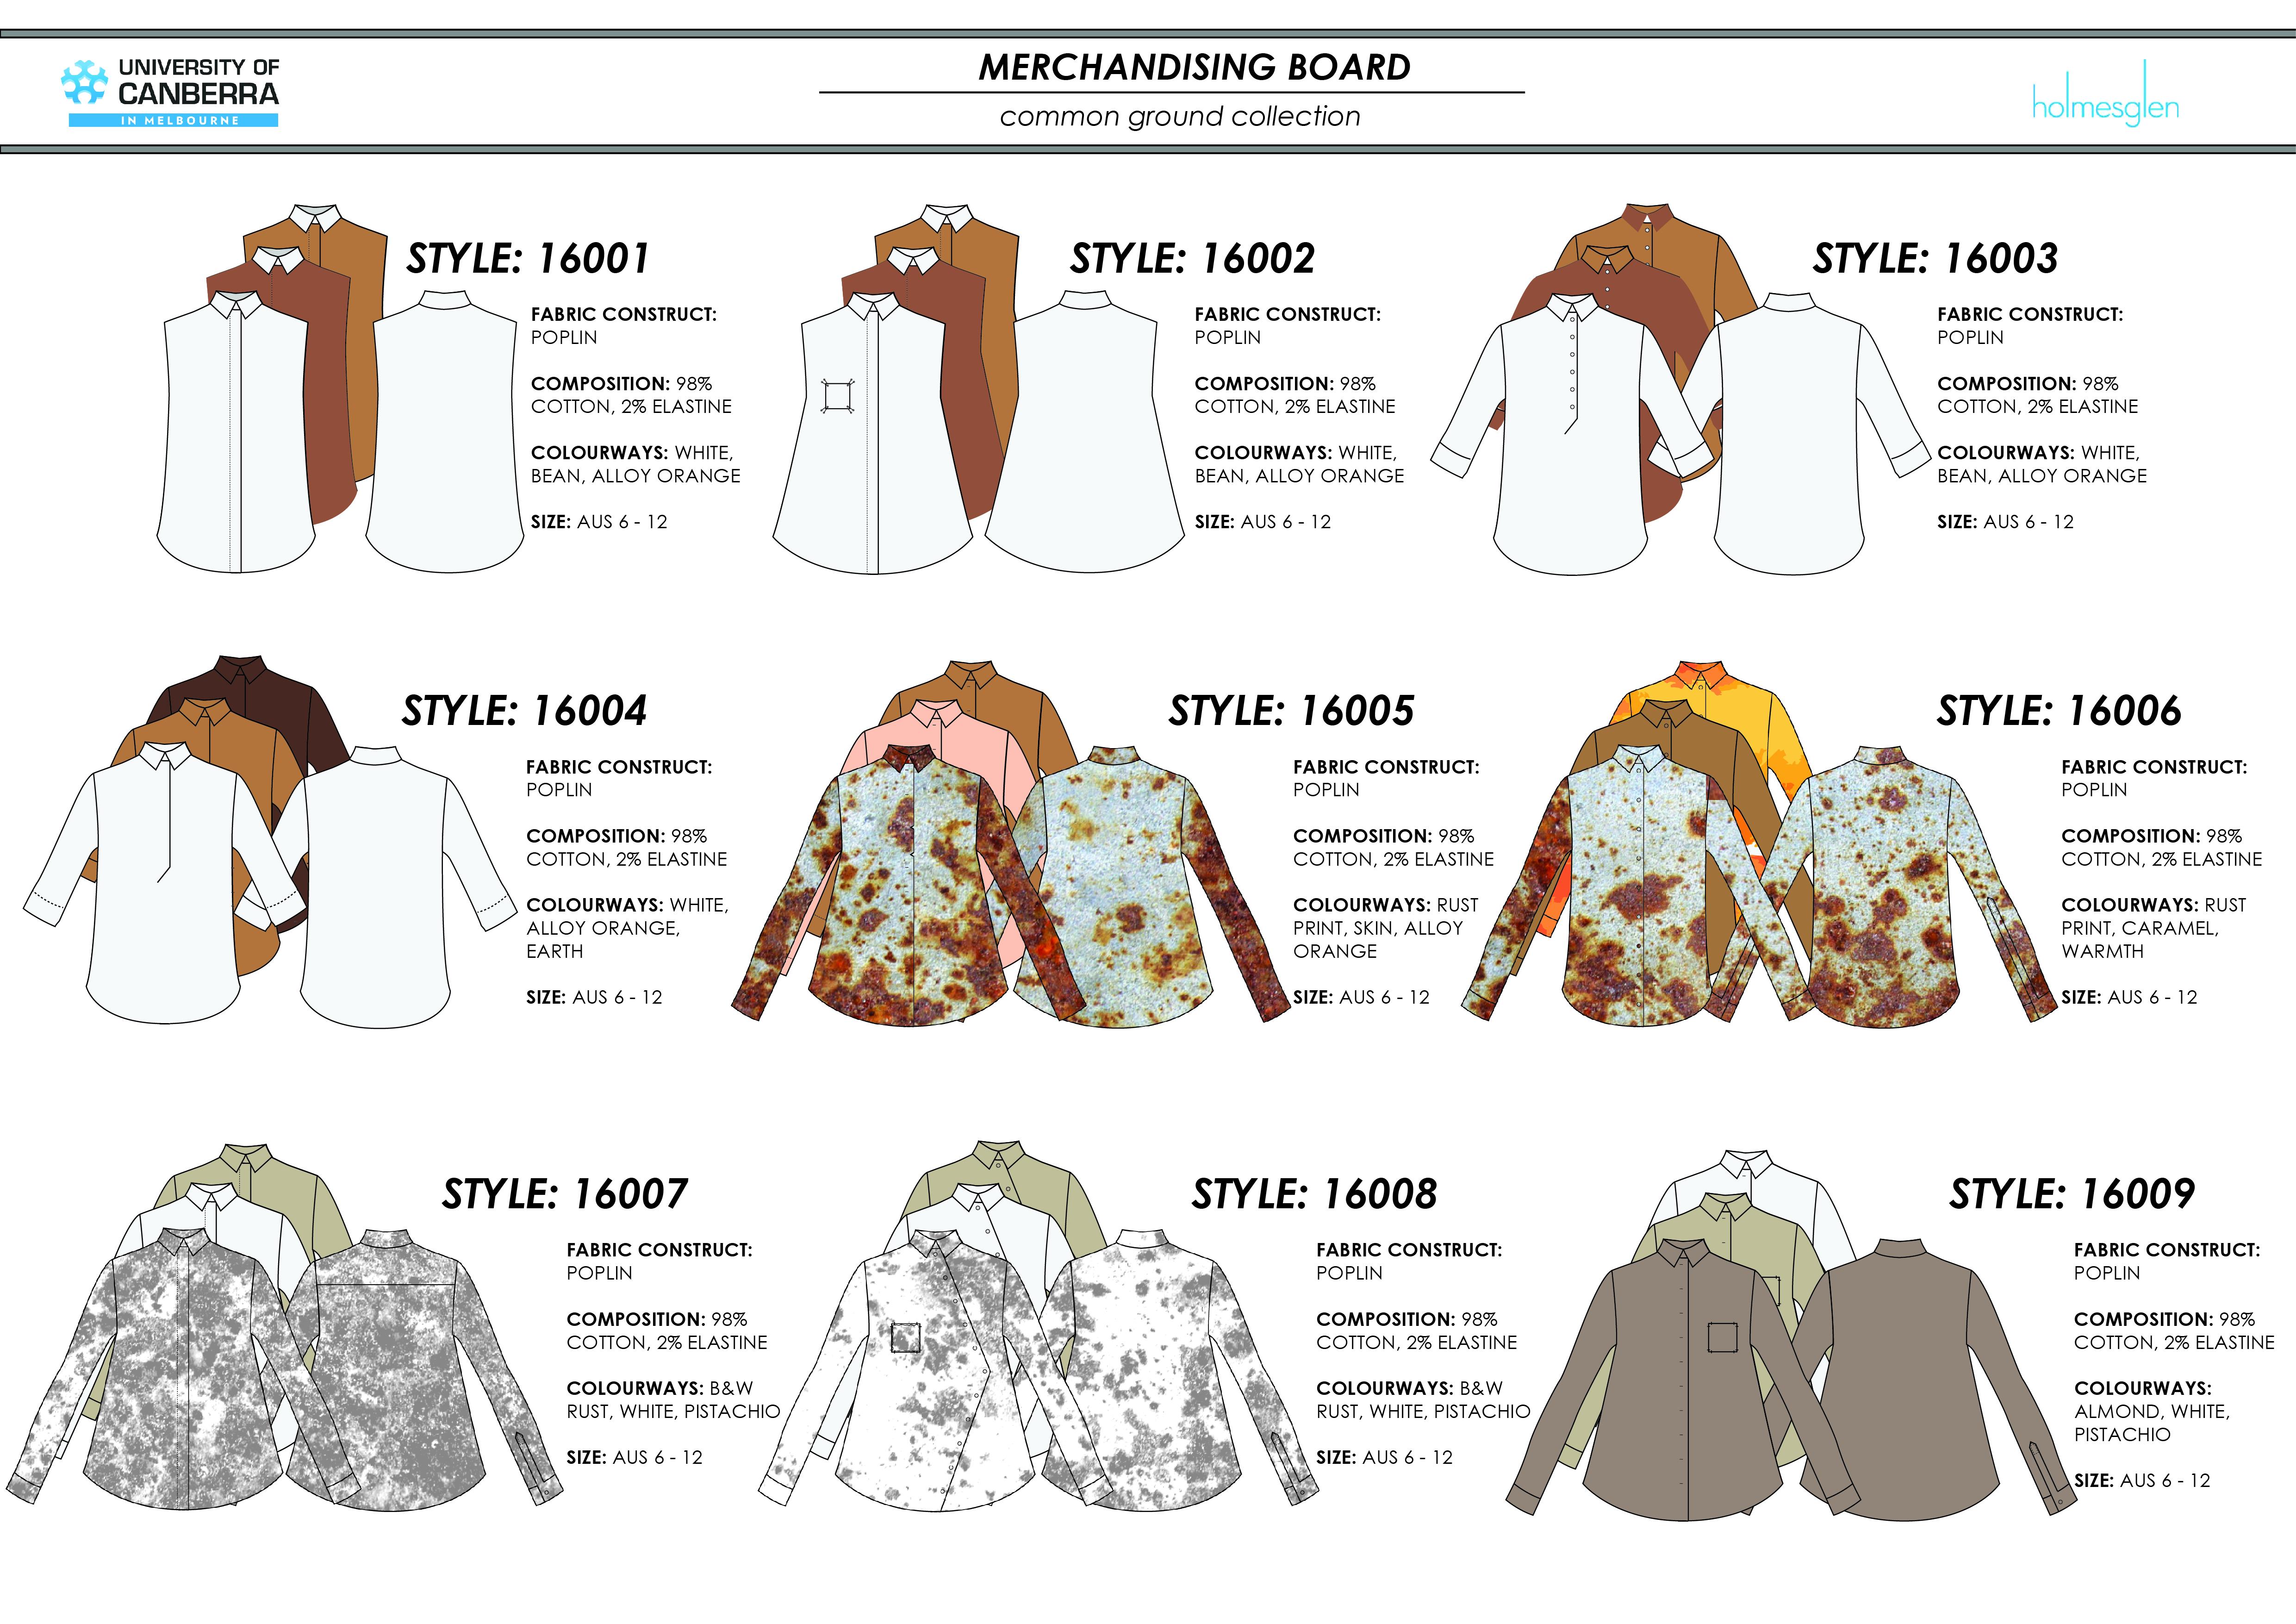 Final Merchandising Board-01